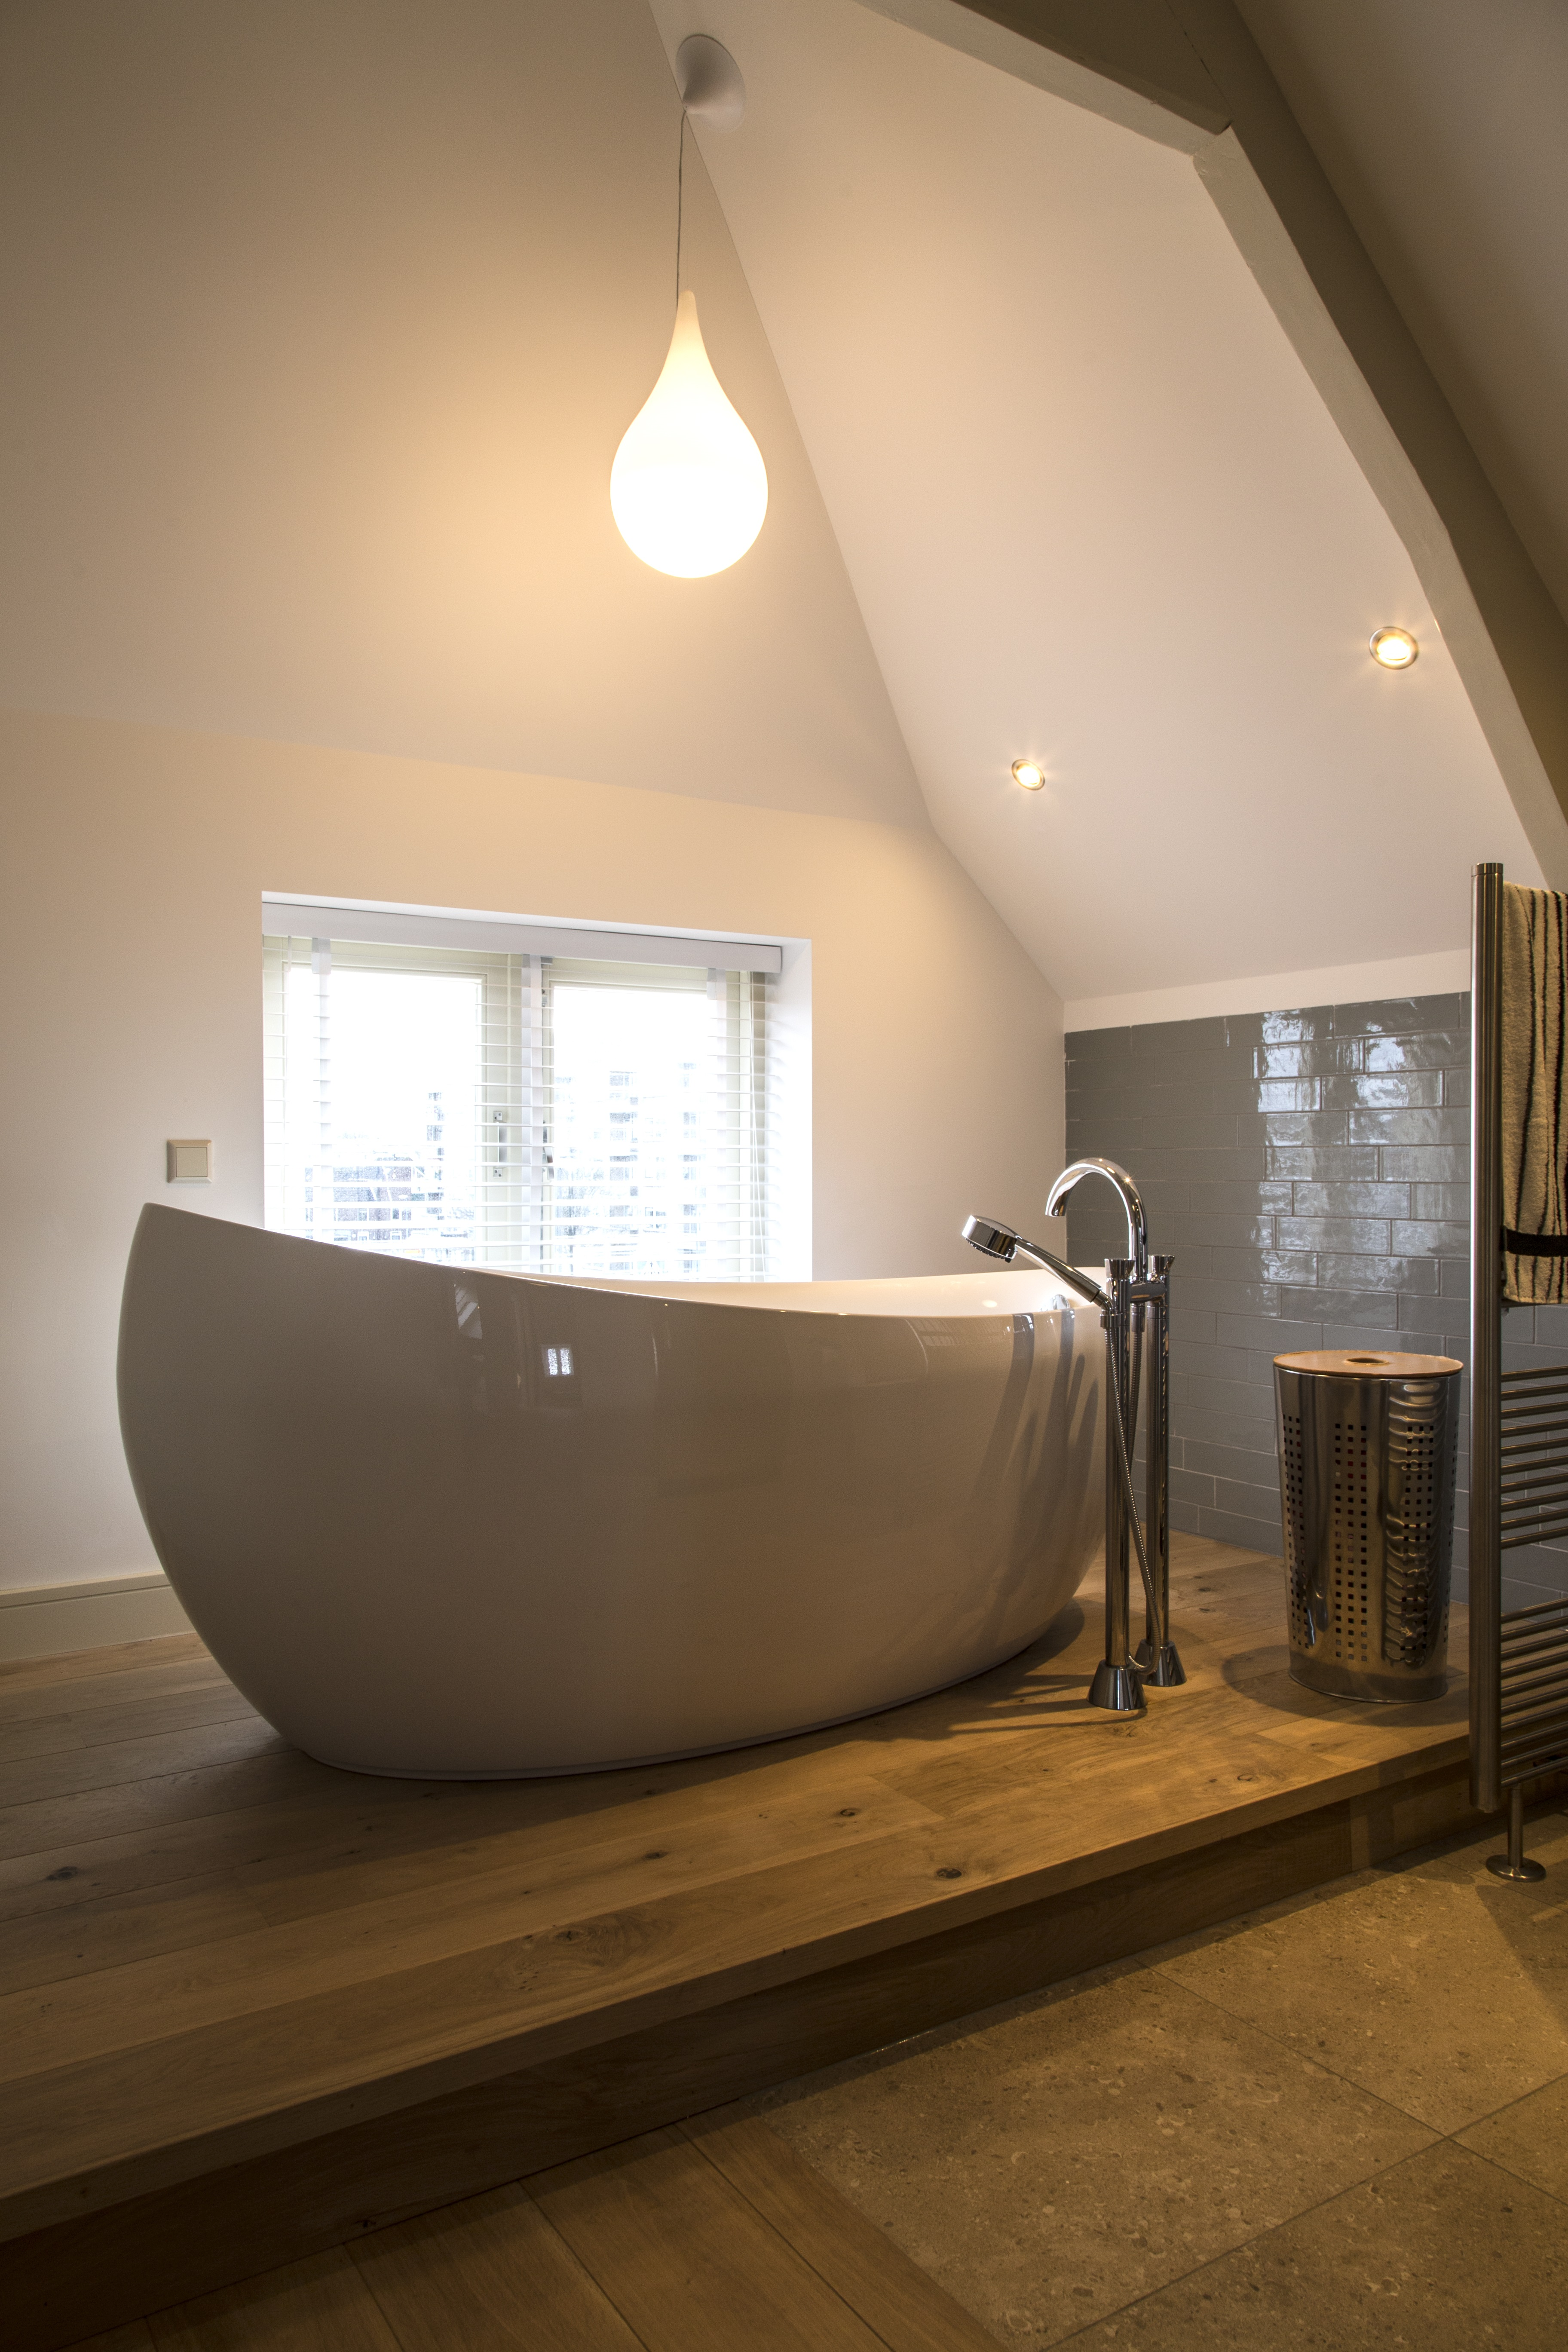 Inspiratie: Aluminium jaloezieën in de badkamer | INHUIS Plaza